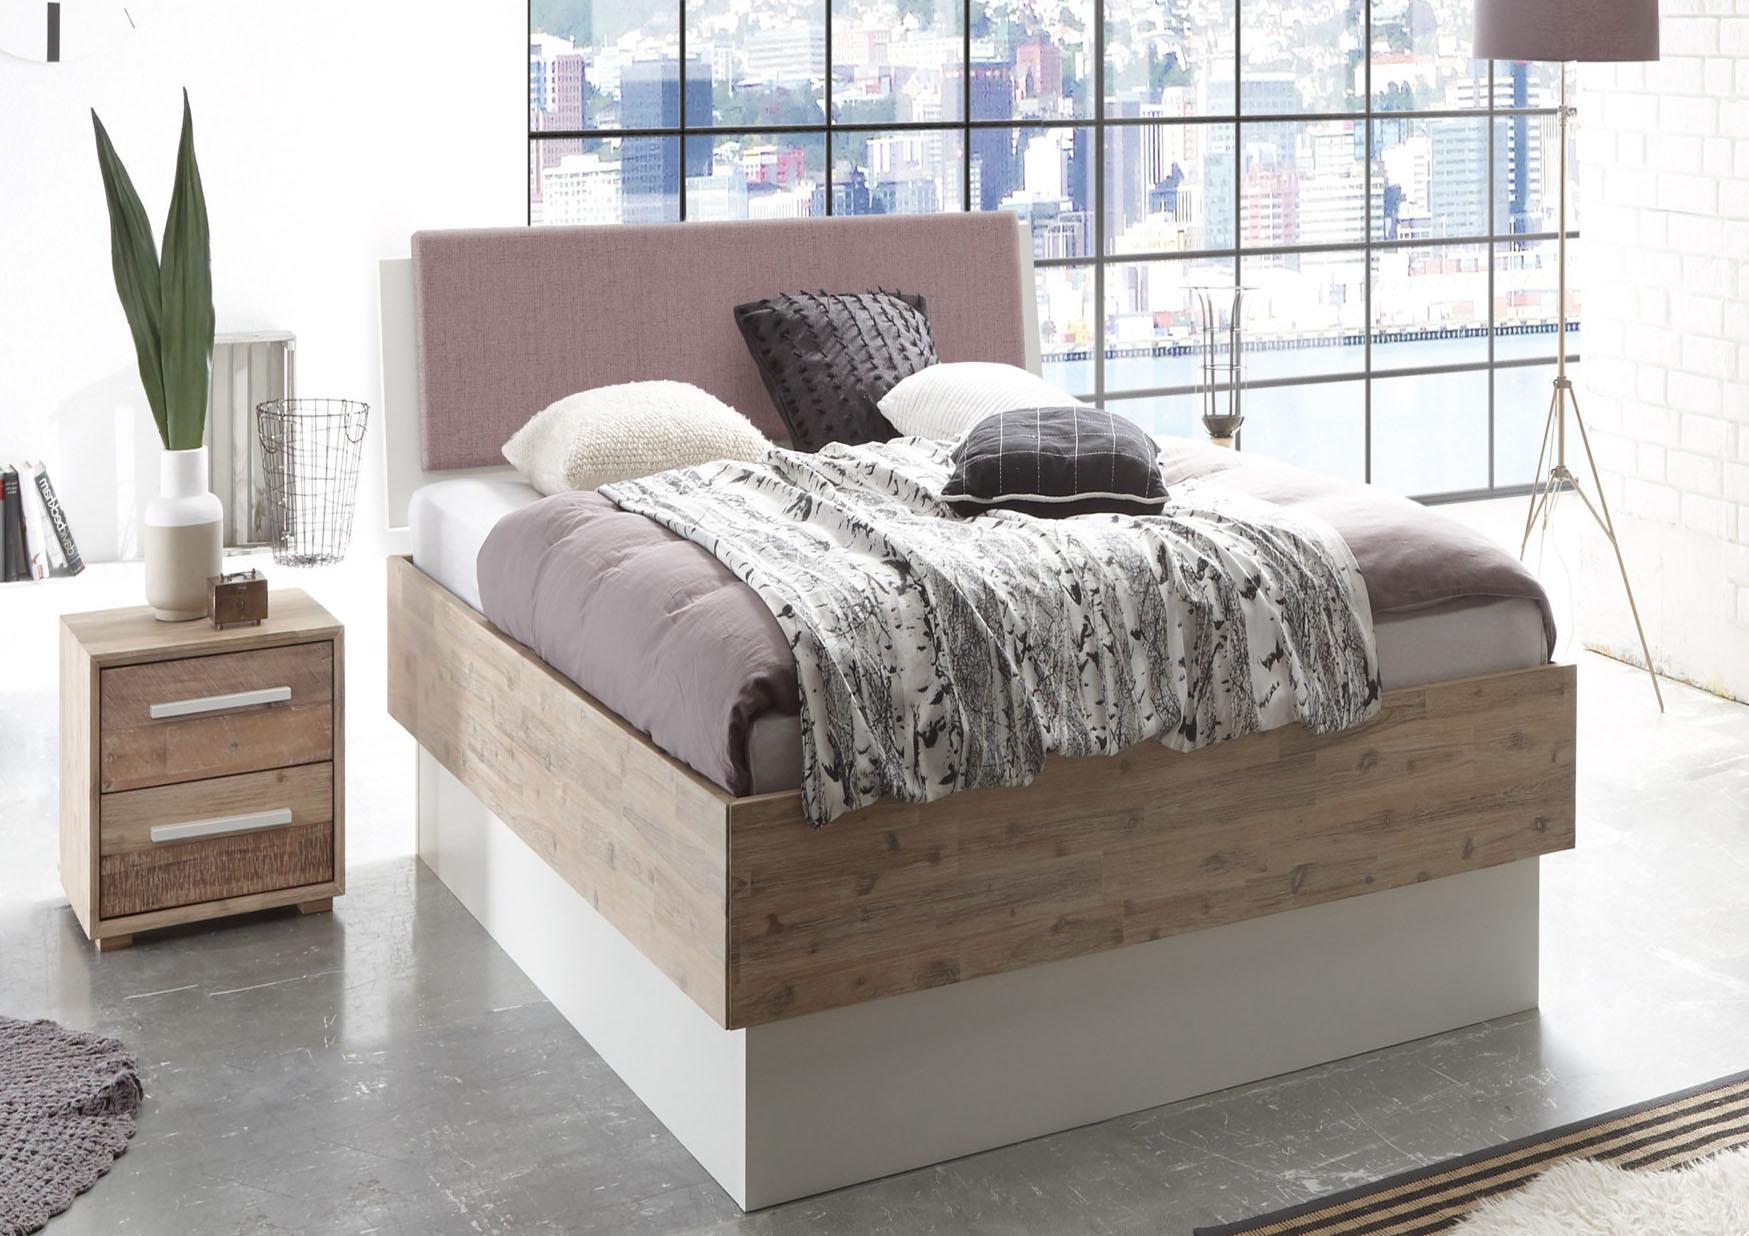 kinderbett 90x200 mit rausfallschutz. Black Bedroom Furniture Sets. Home Design Ideas